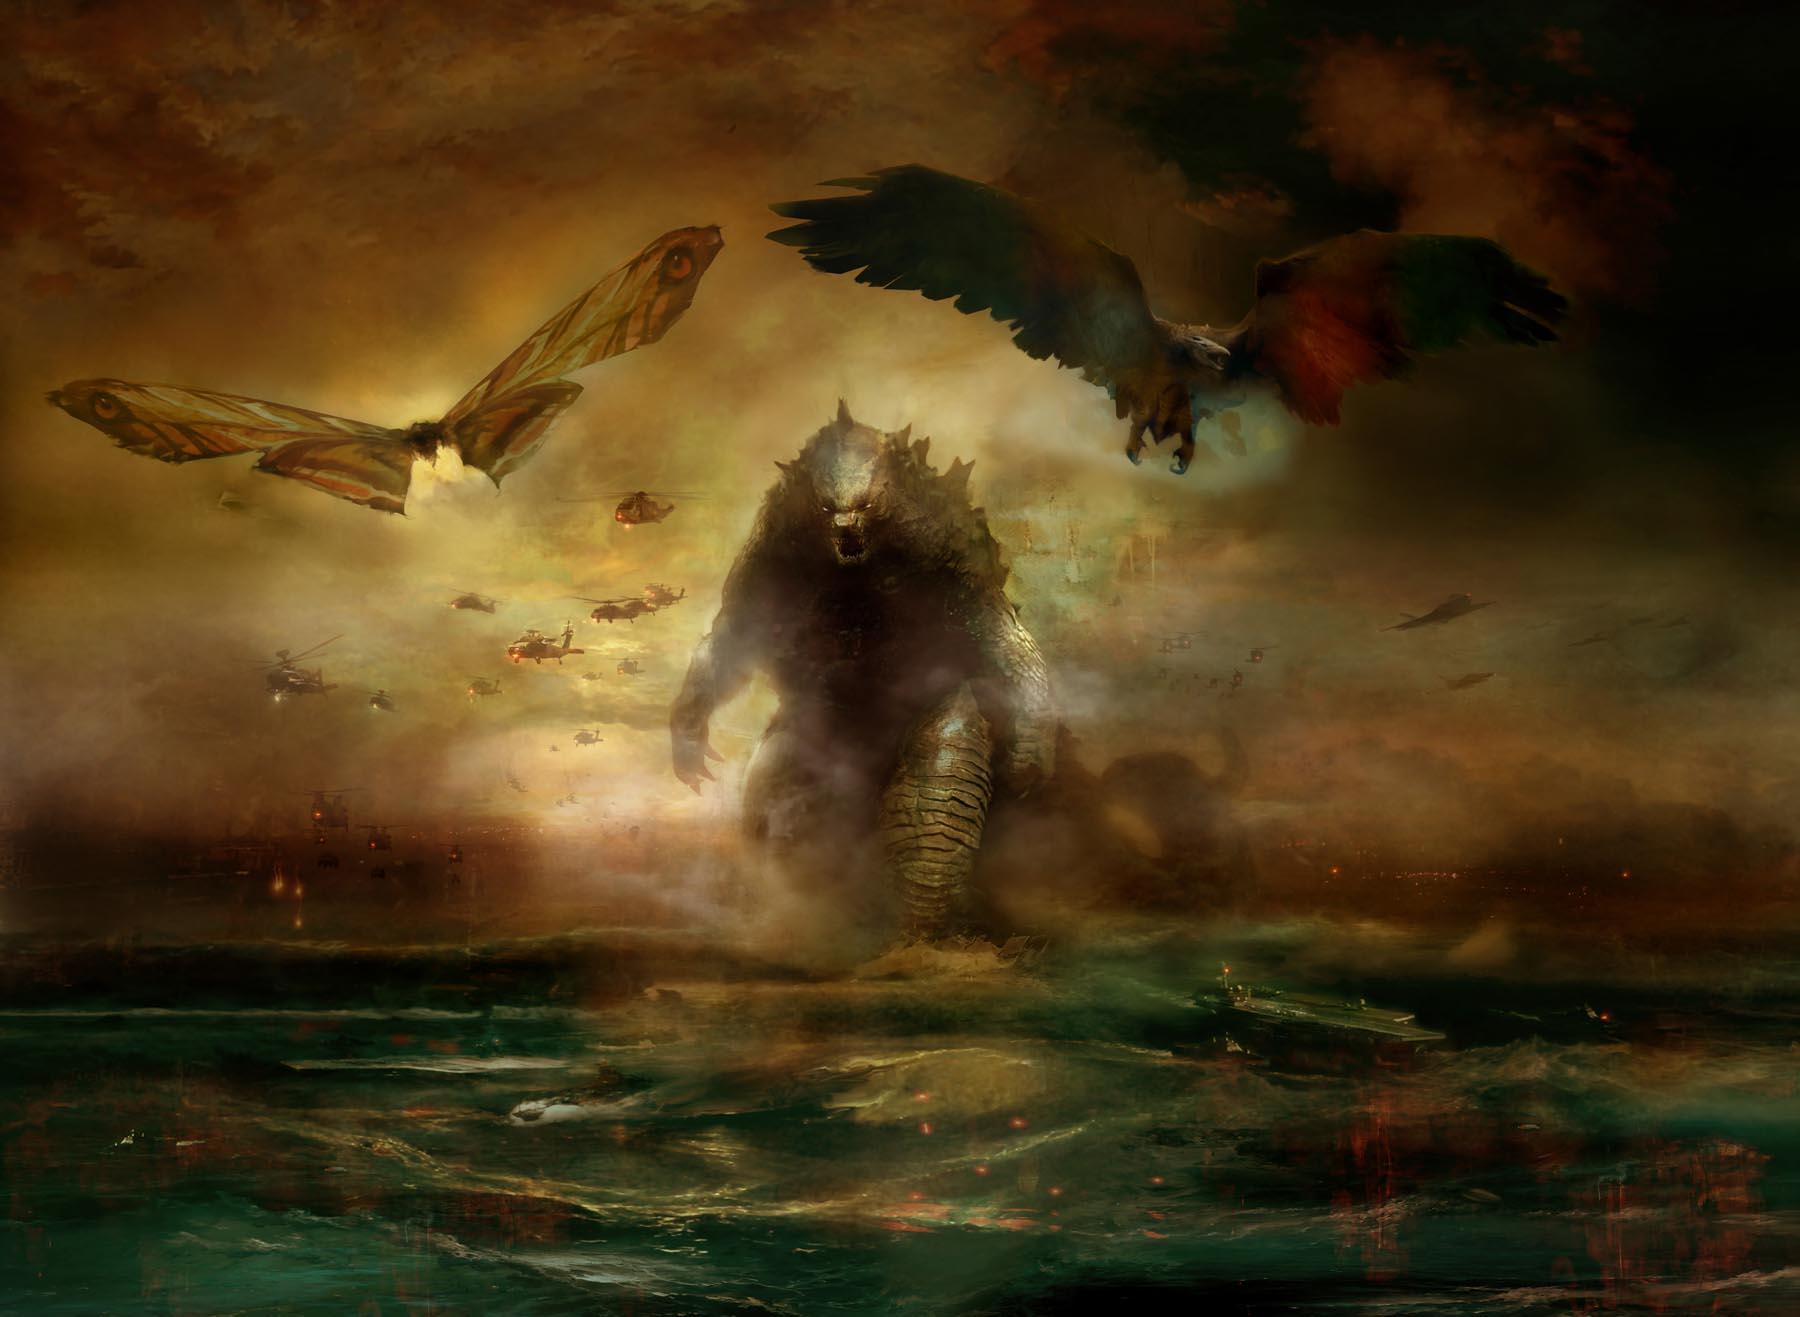 godzilla-king-monsters-concept-art-2